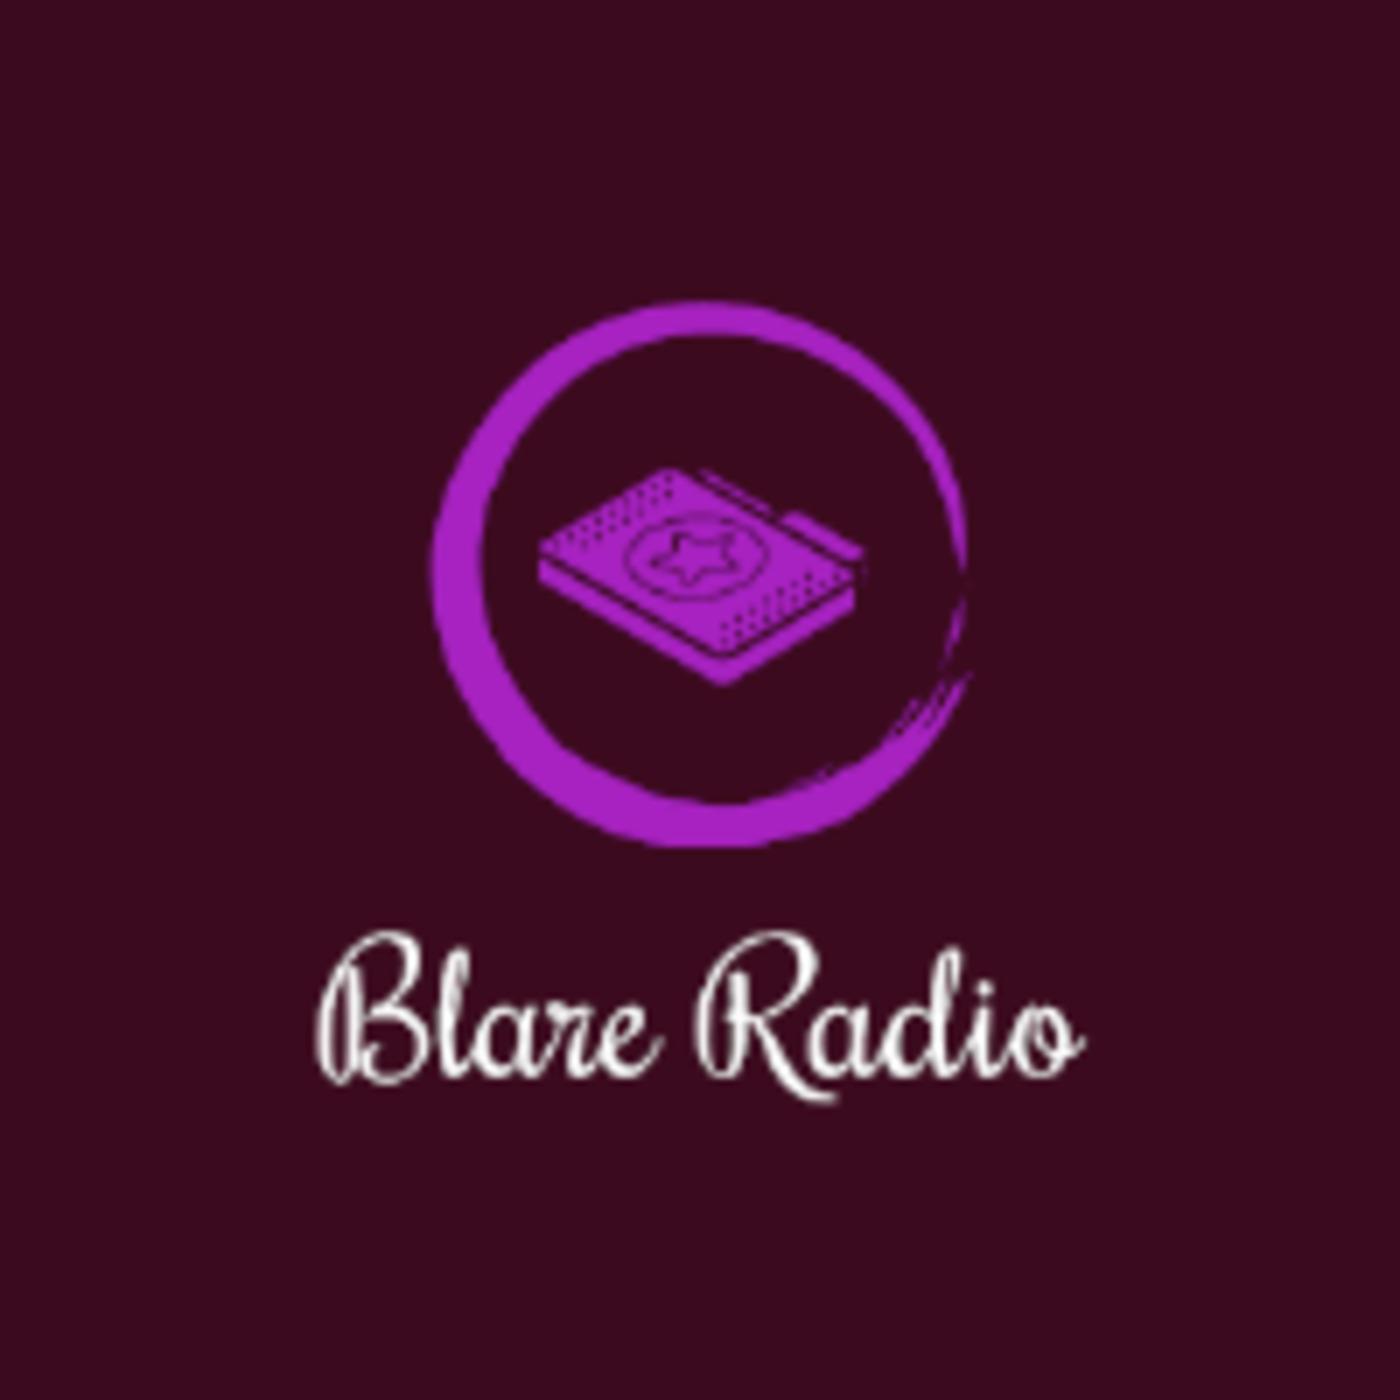 Radio Blare